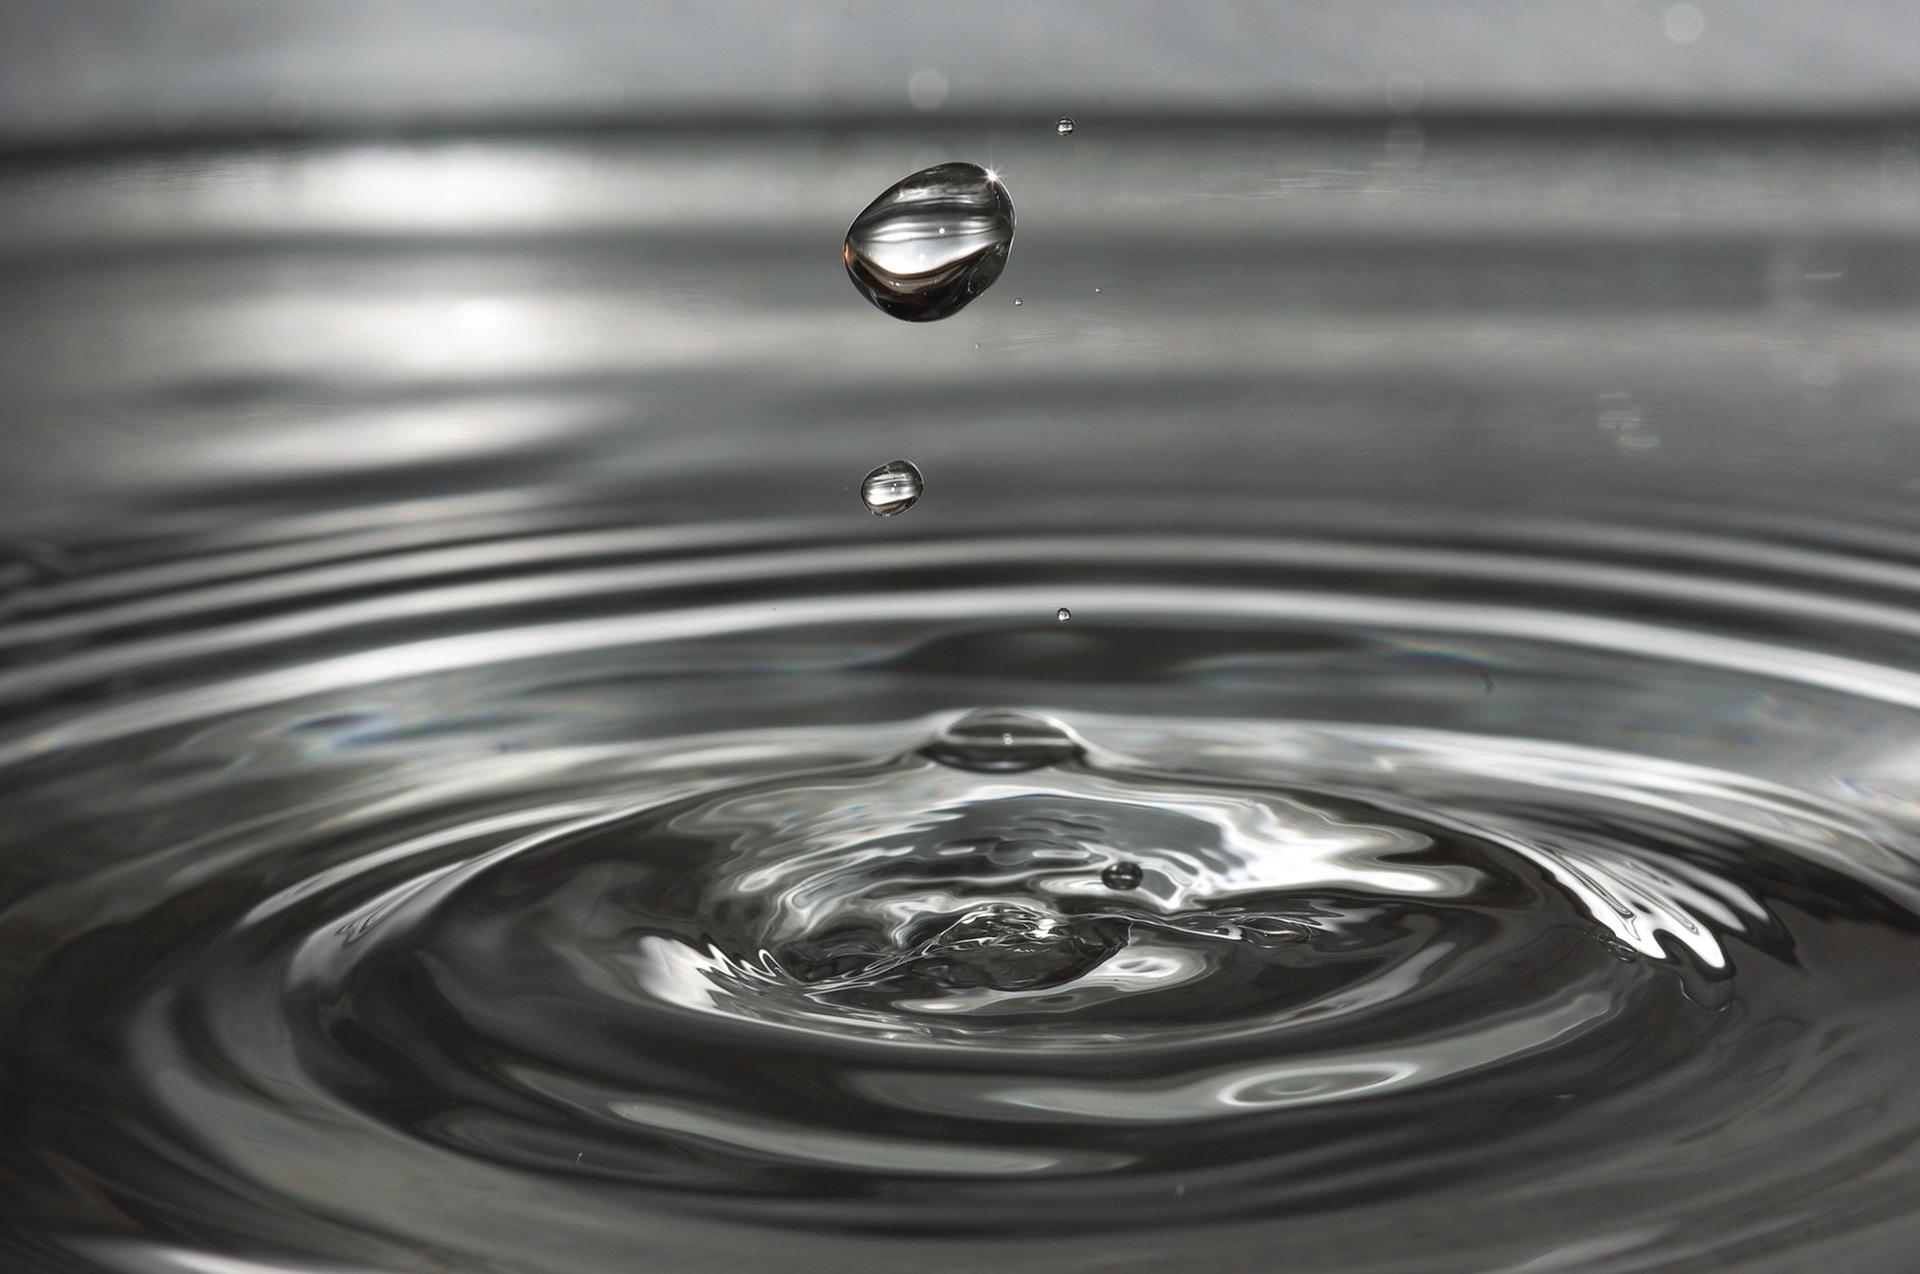 Hydroponic Drip Irrigation System - Indoor Gardening